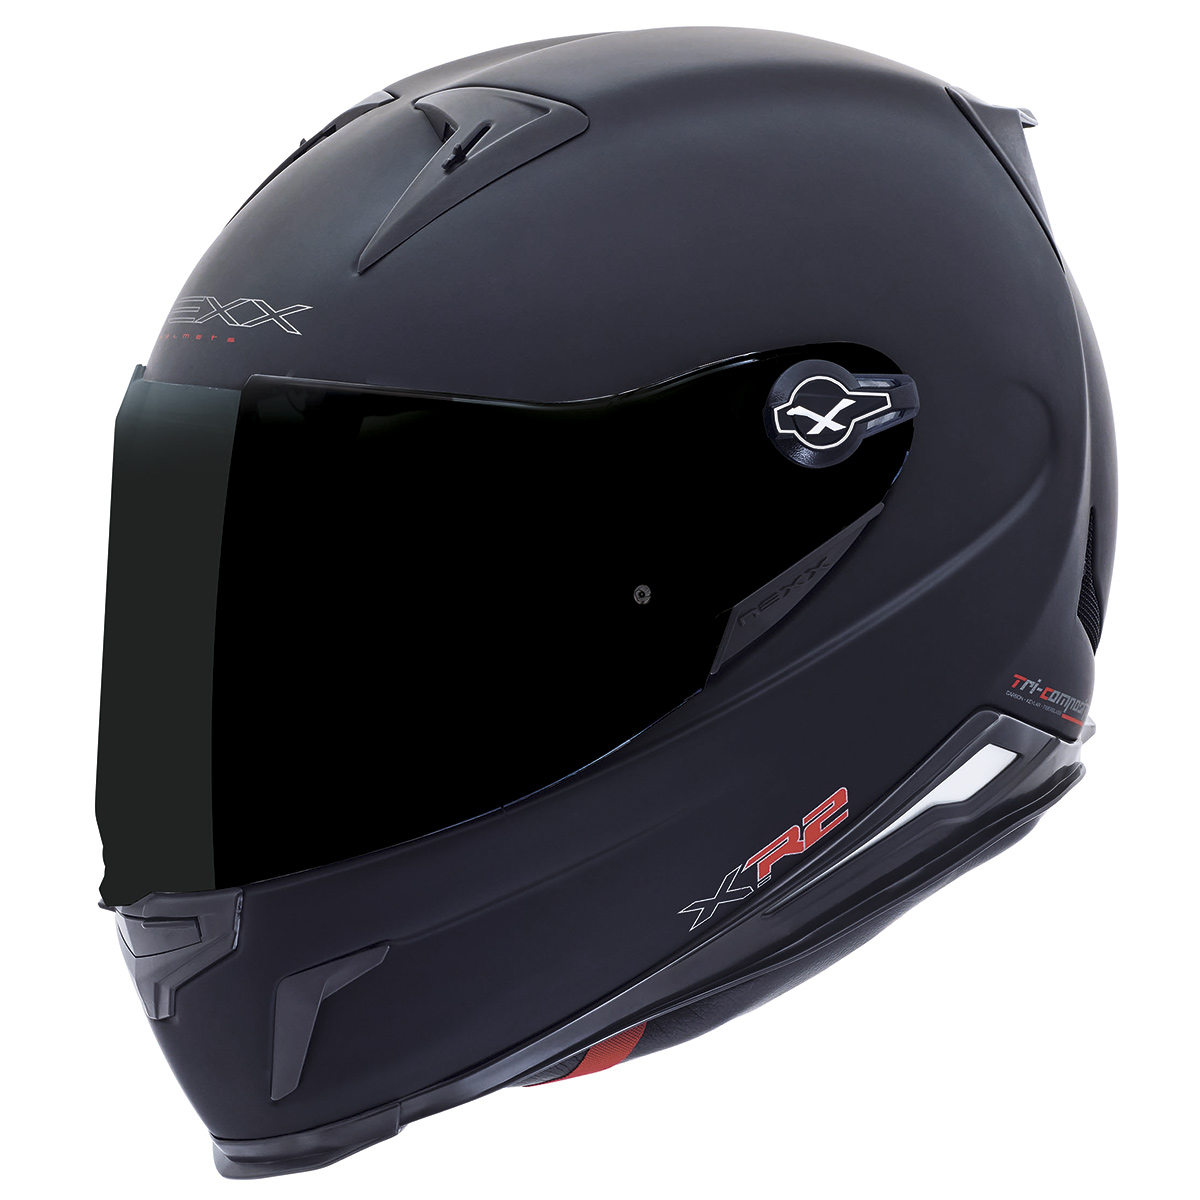 ... Capacete Nexx XR2 Plain Preto Brilho Tri-Composto - Planet Bike Shop  Moto Acessórios ... a571094b27f